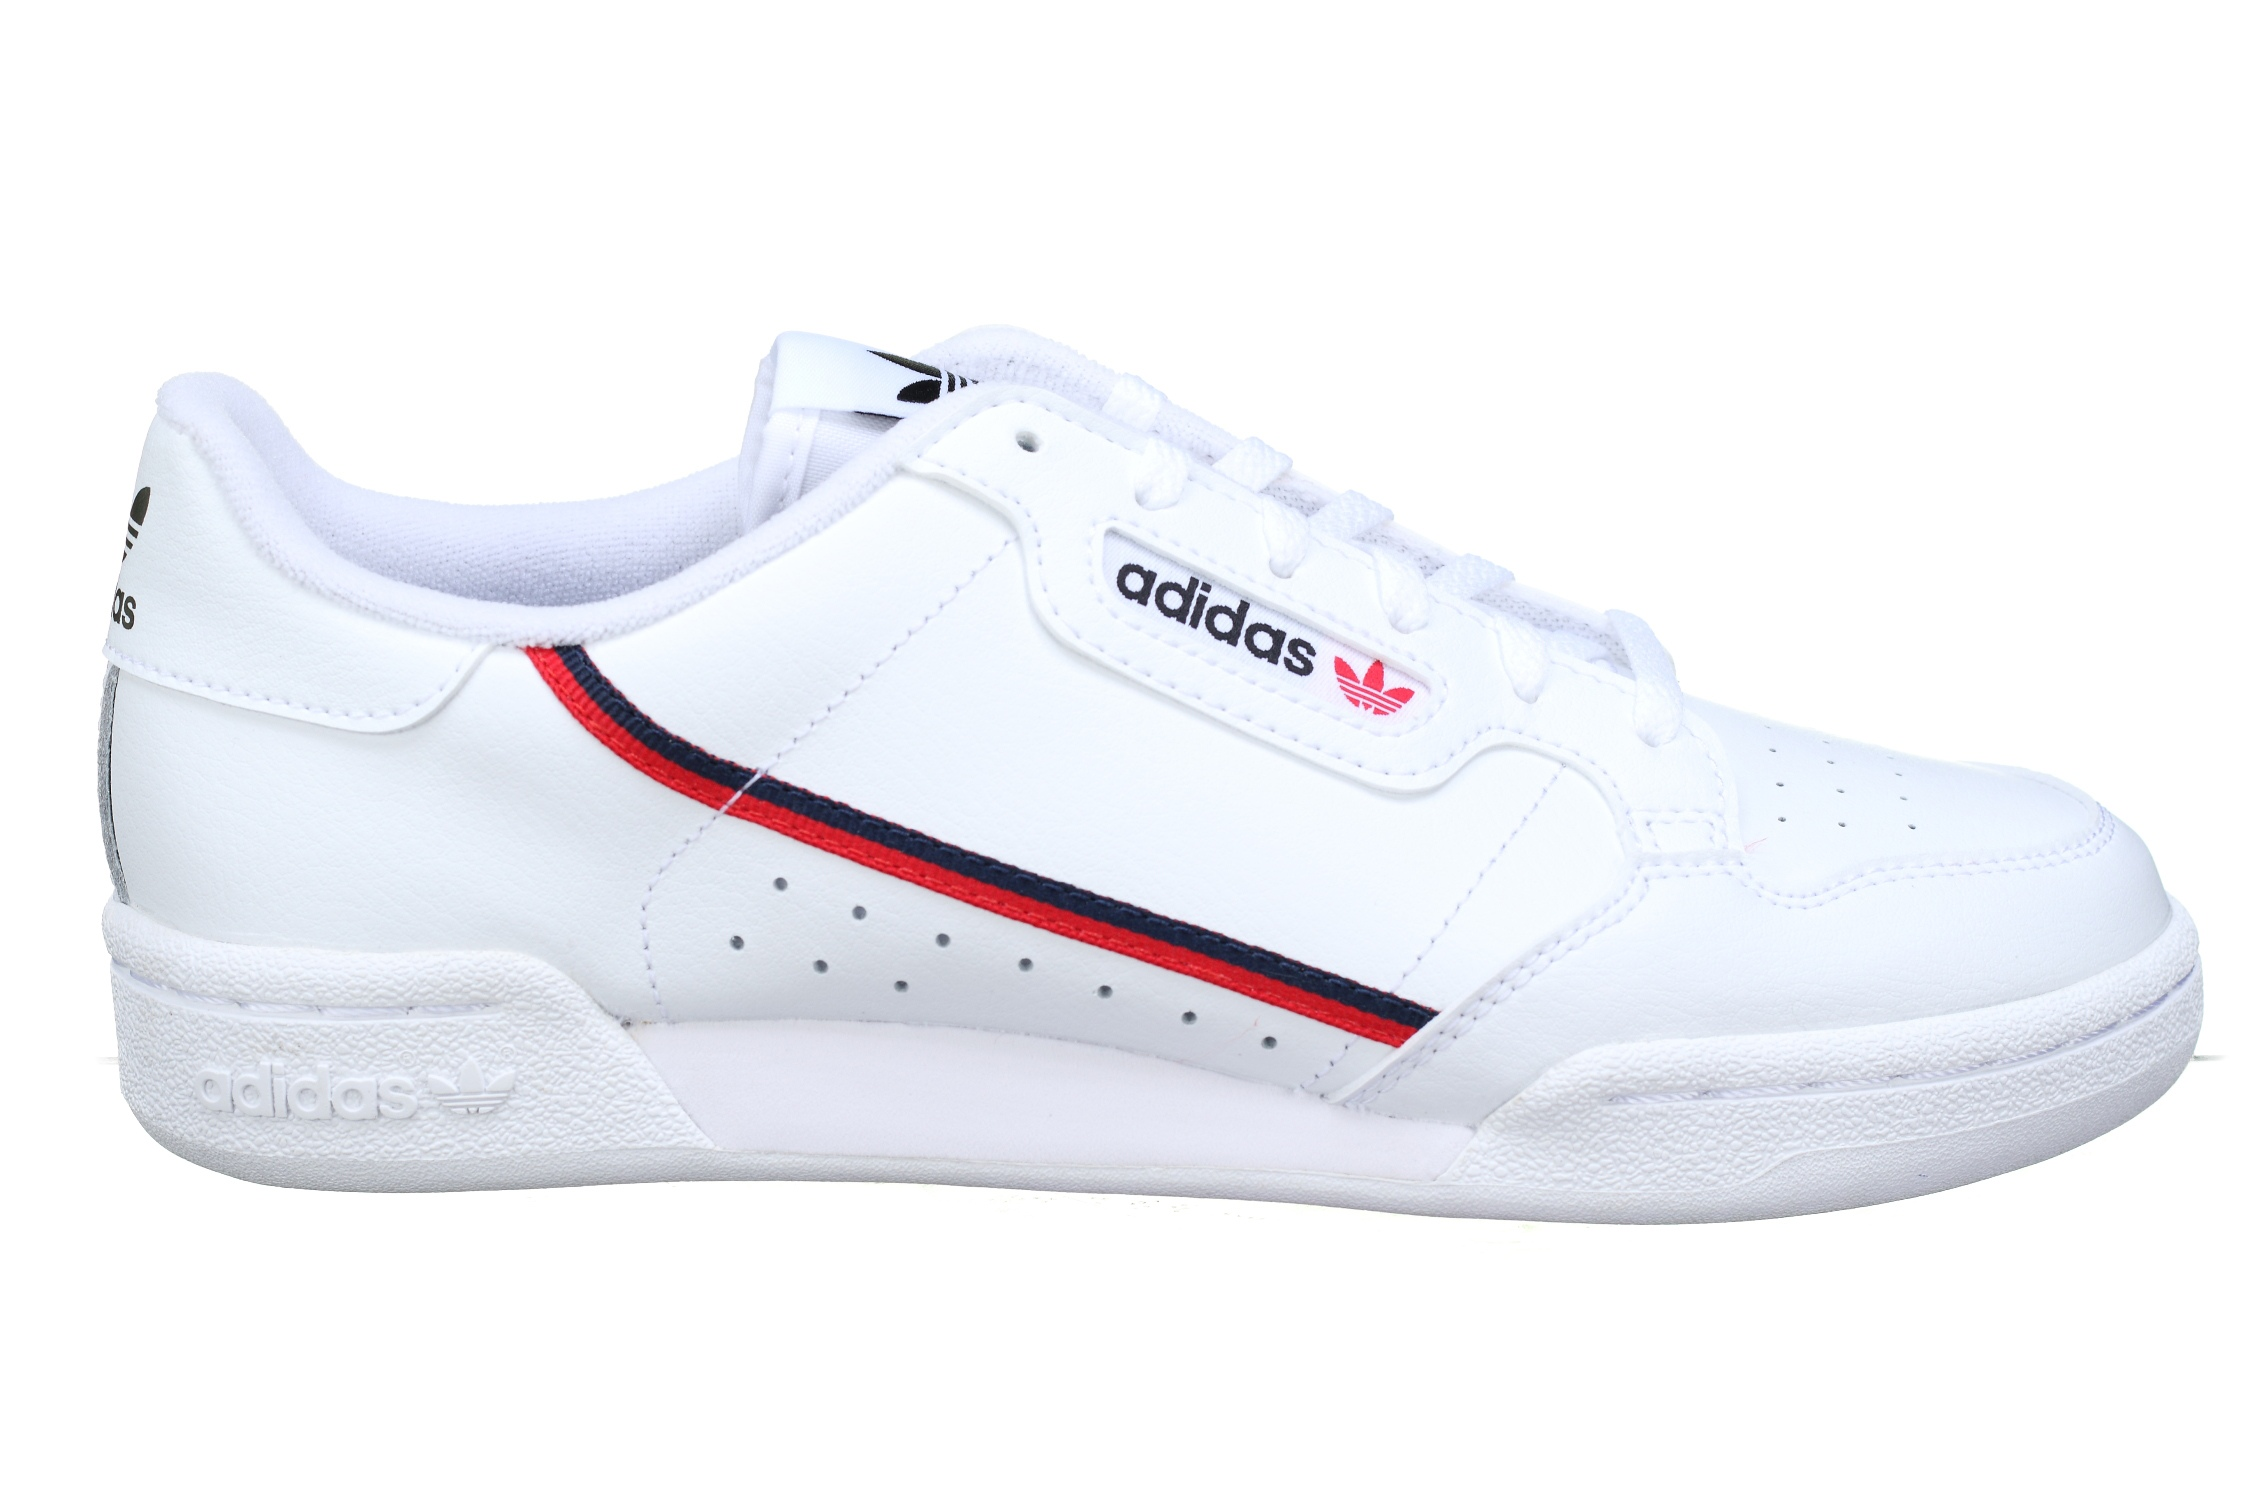 http://www.leadermode.com/162255/adidas-continental-80-j-f99787-white.jpg